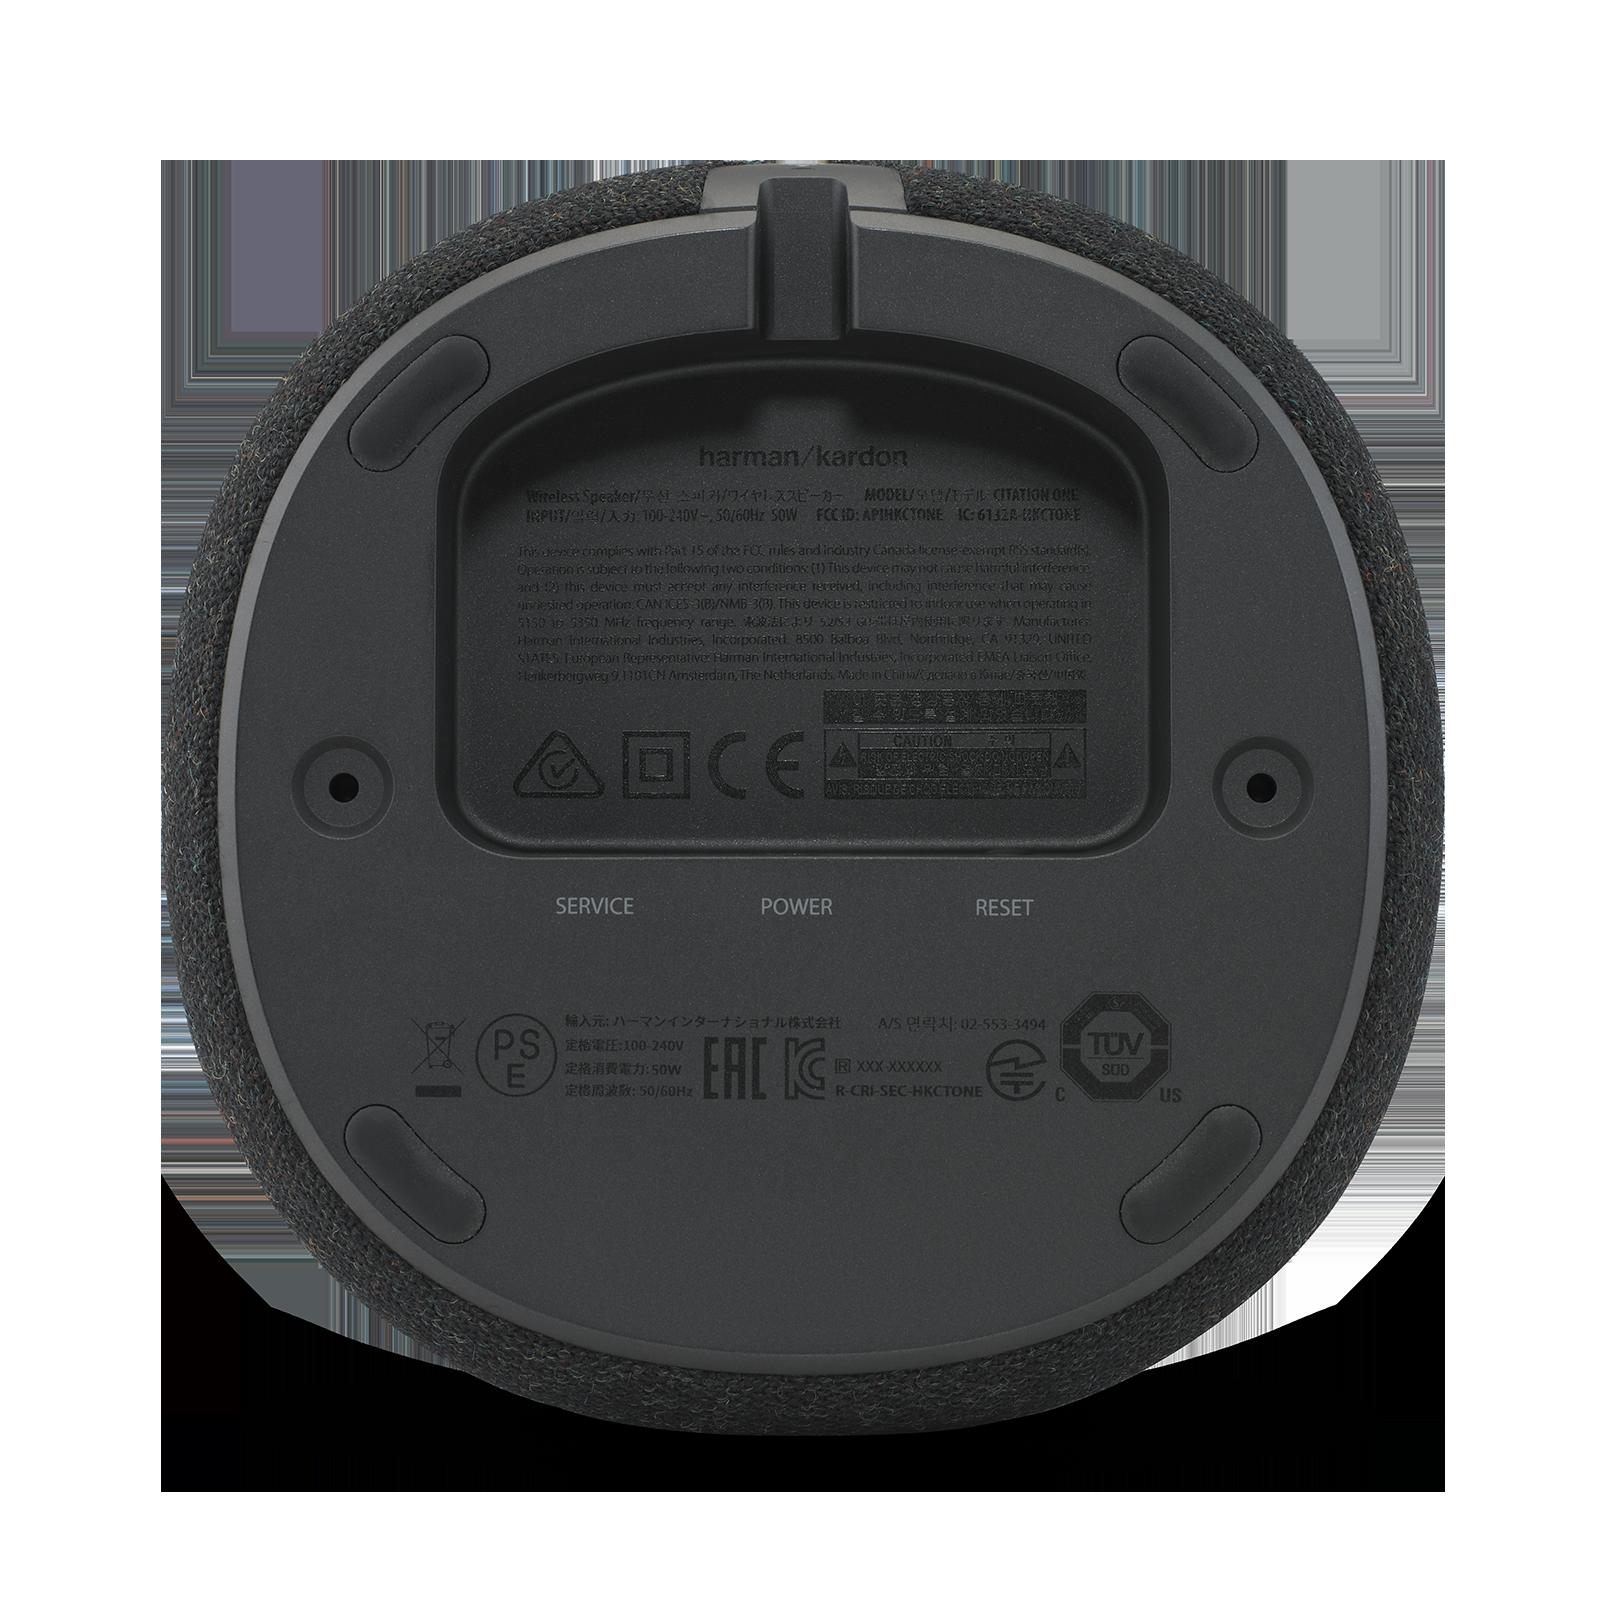 Harman Kardon Citation ONE DUO - Black - Compact, smart and amazing sound - Detailshot 2